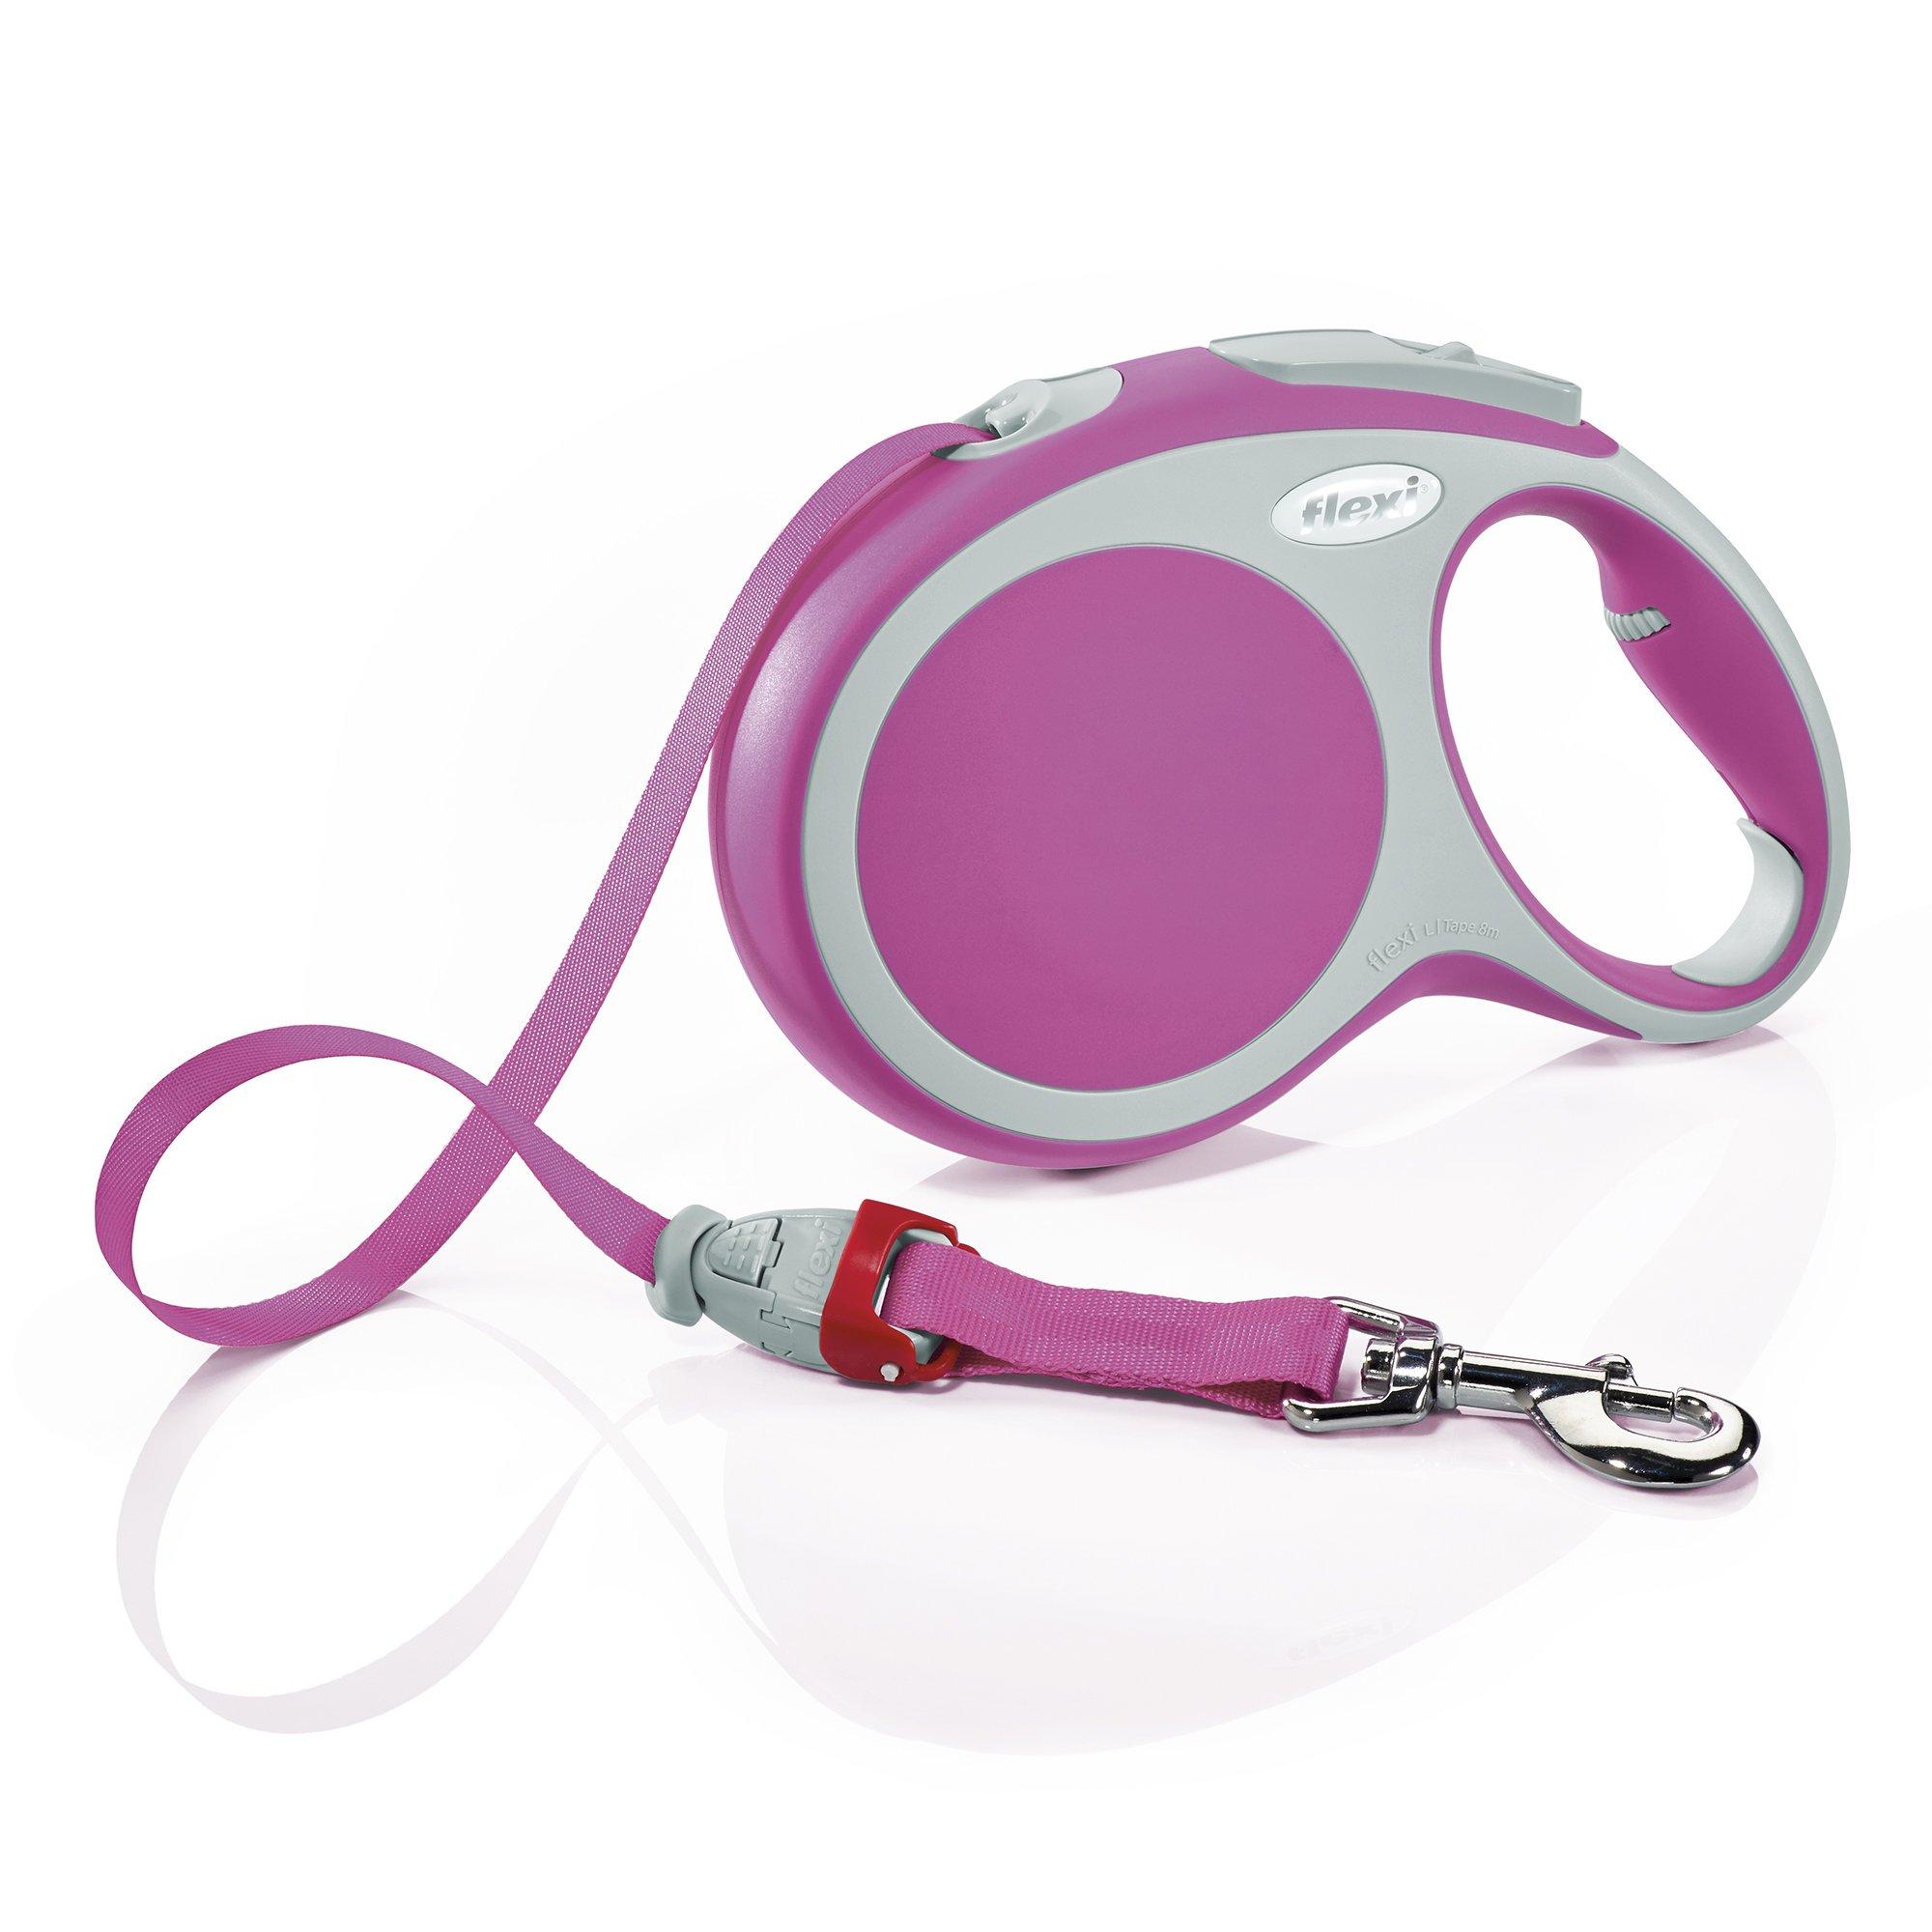 Flexi Vario Retractable Dog Leash (Tape), 26 ft, Large, Pink